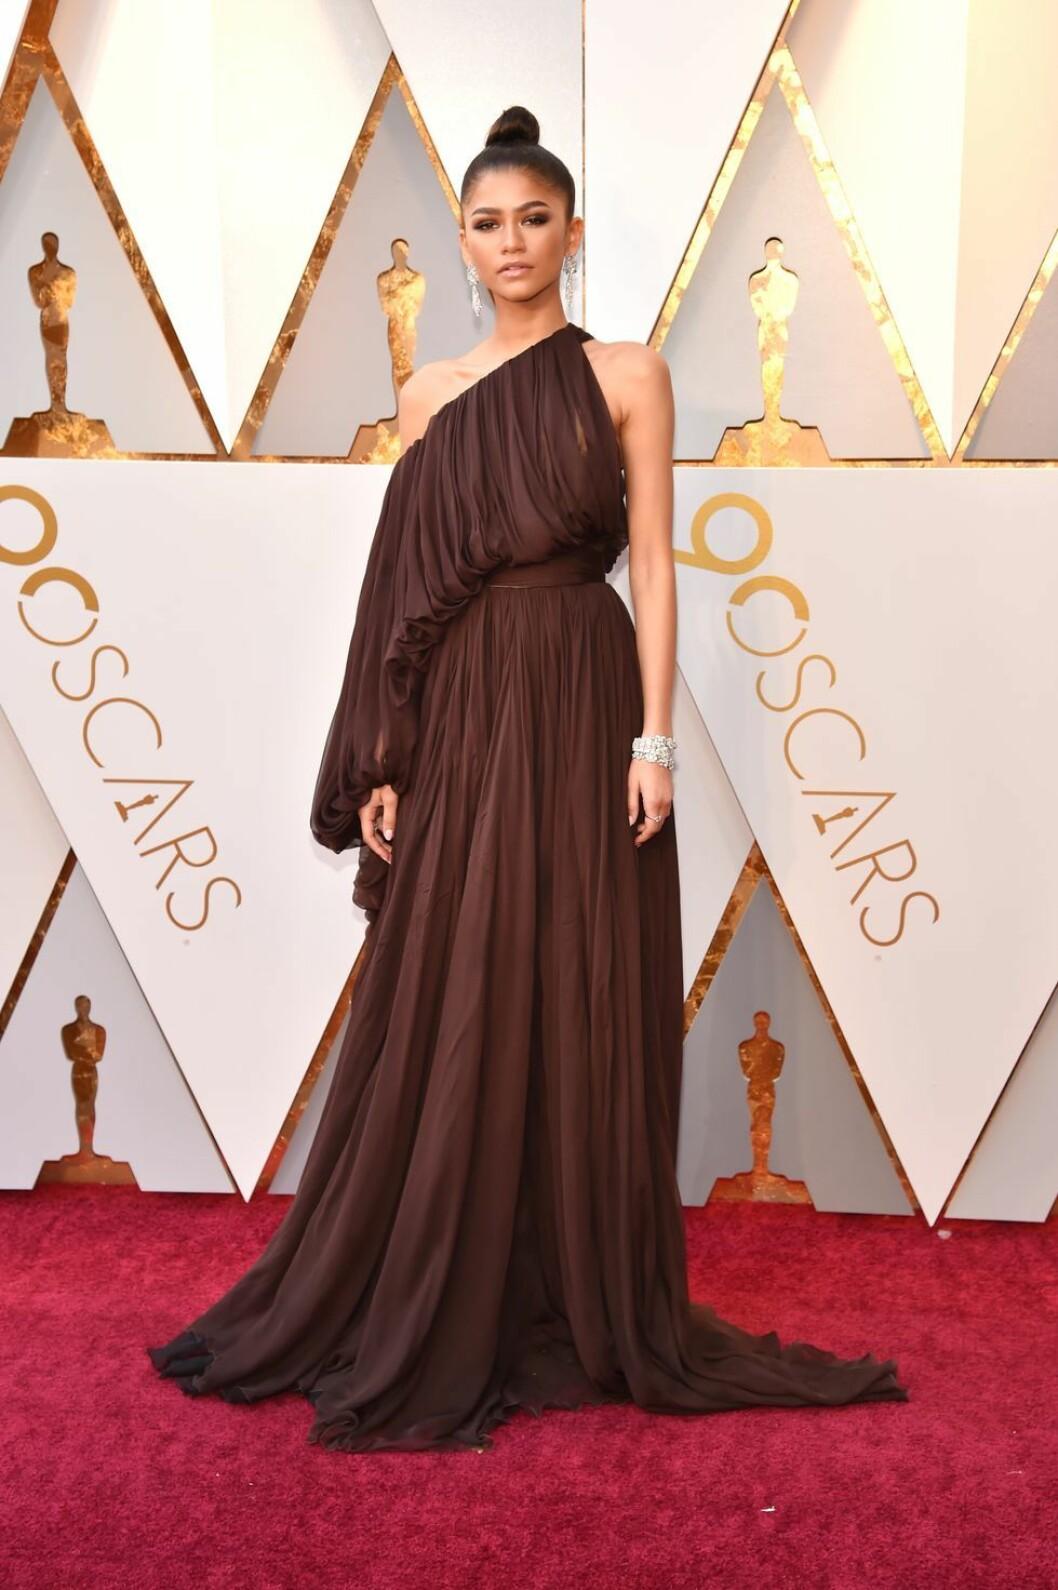 Zendaya i Giambattista-Valli på Oscarsgalan 2018